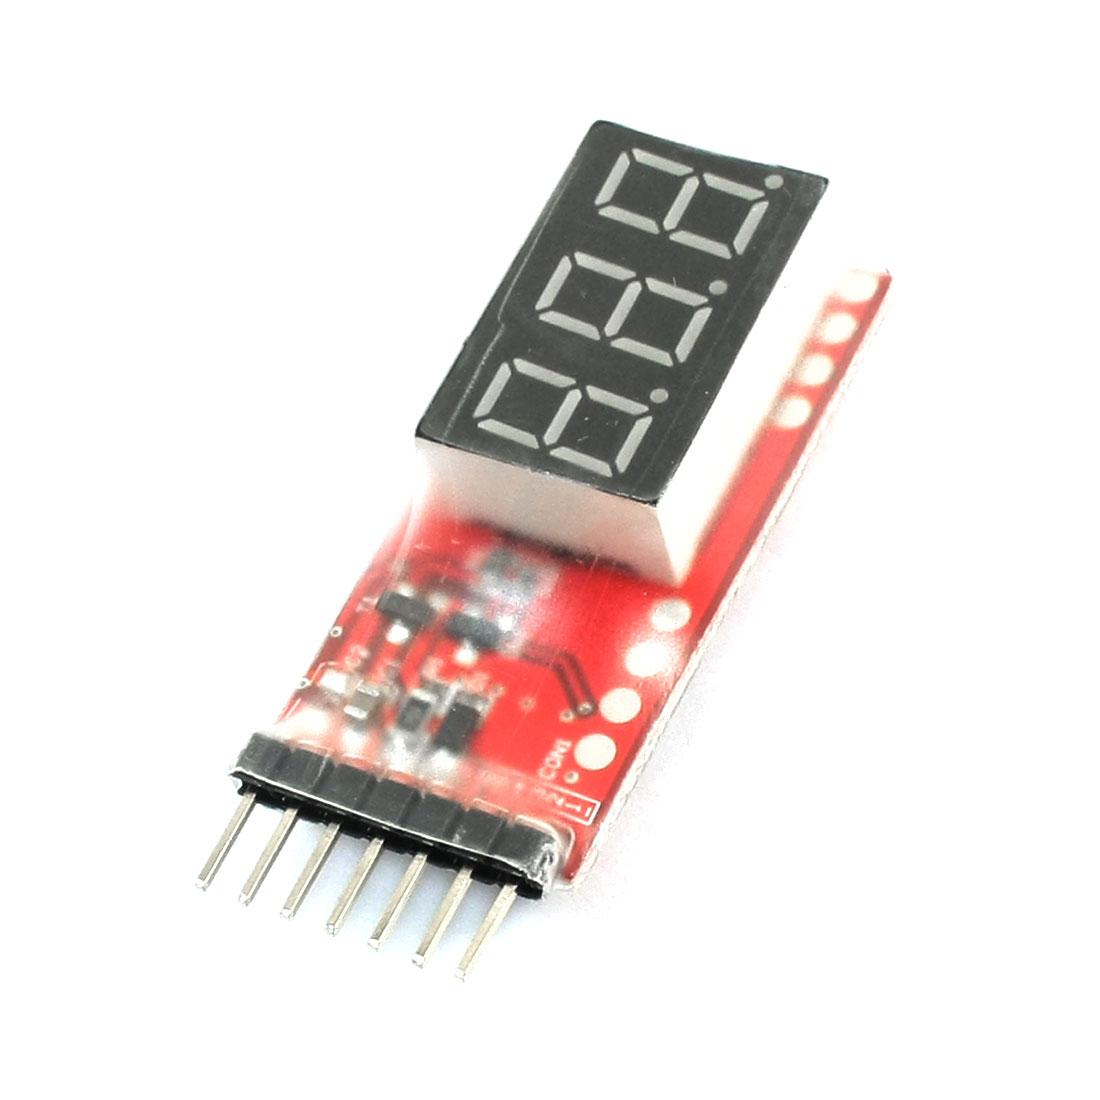 LED Display 7.4V-22.2V 2S-6S Cells Lipo Battery Voltage Monitor Meter